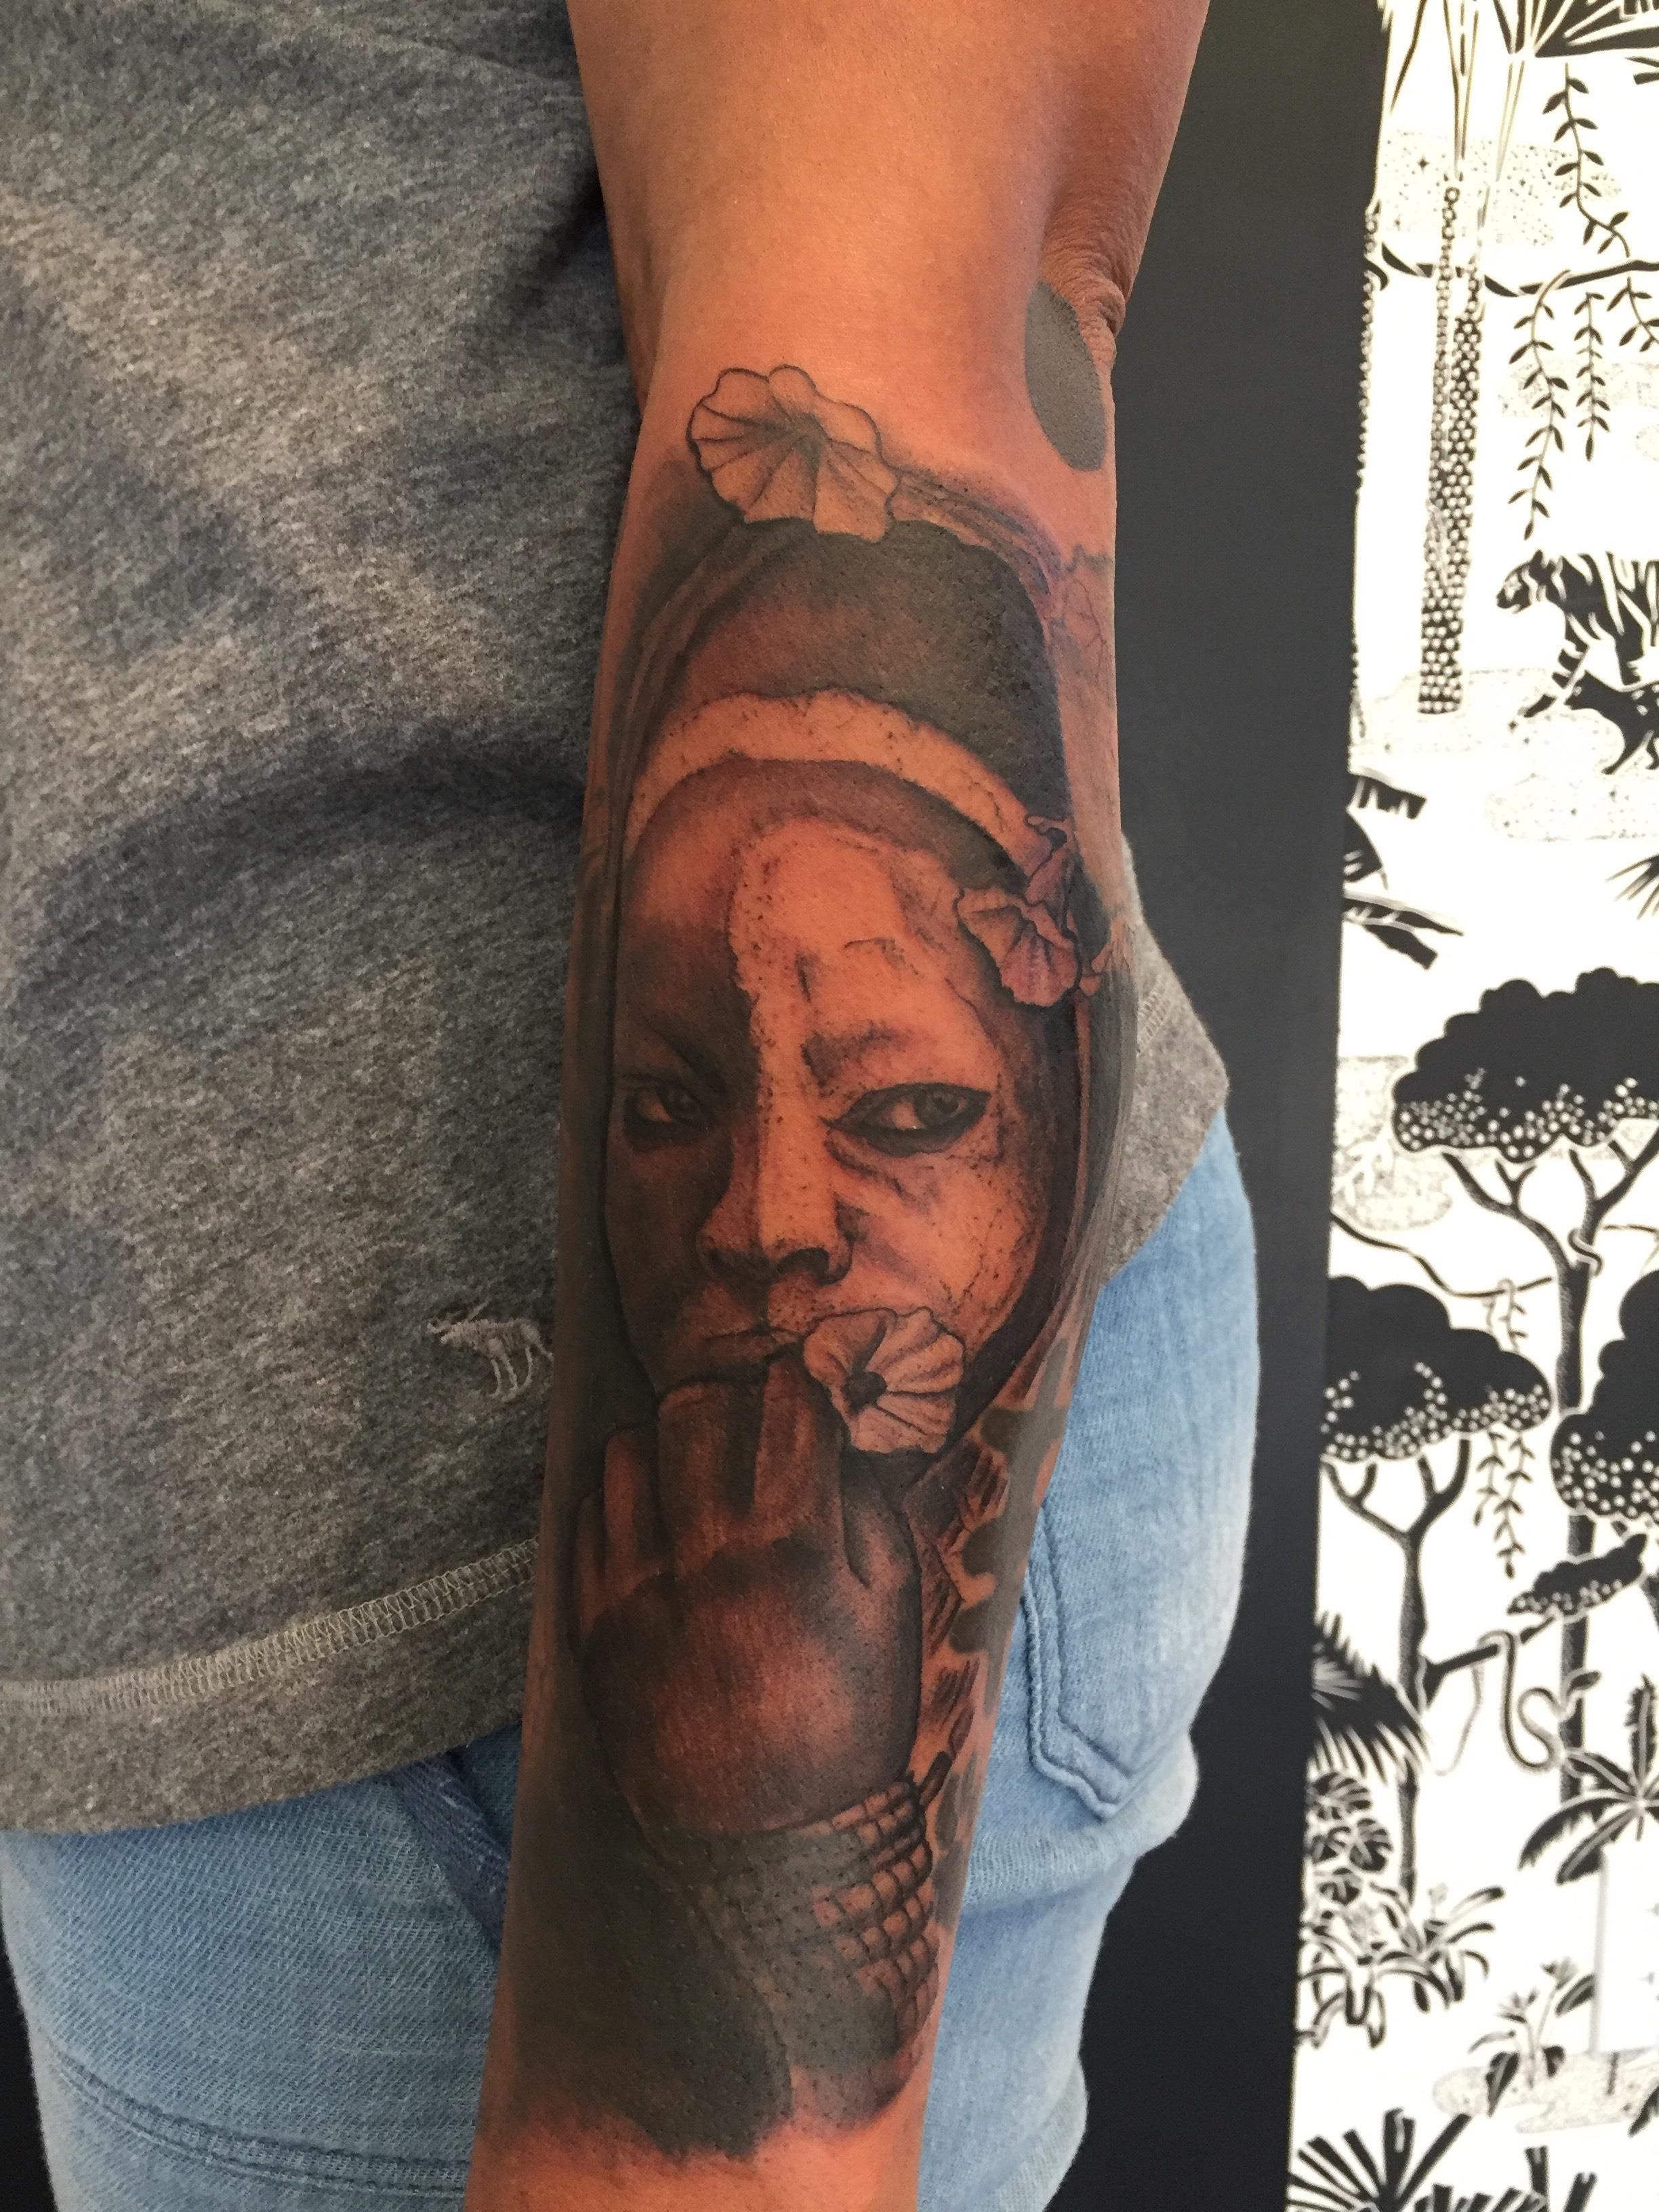 5cc51d3f9 (Courtesy Photo). Morton: Why might tattoo artists struggle on tattooing  dark skin?